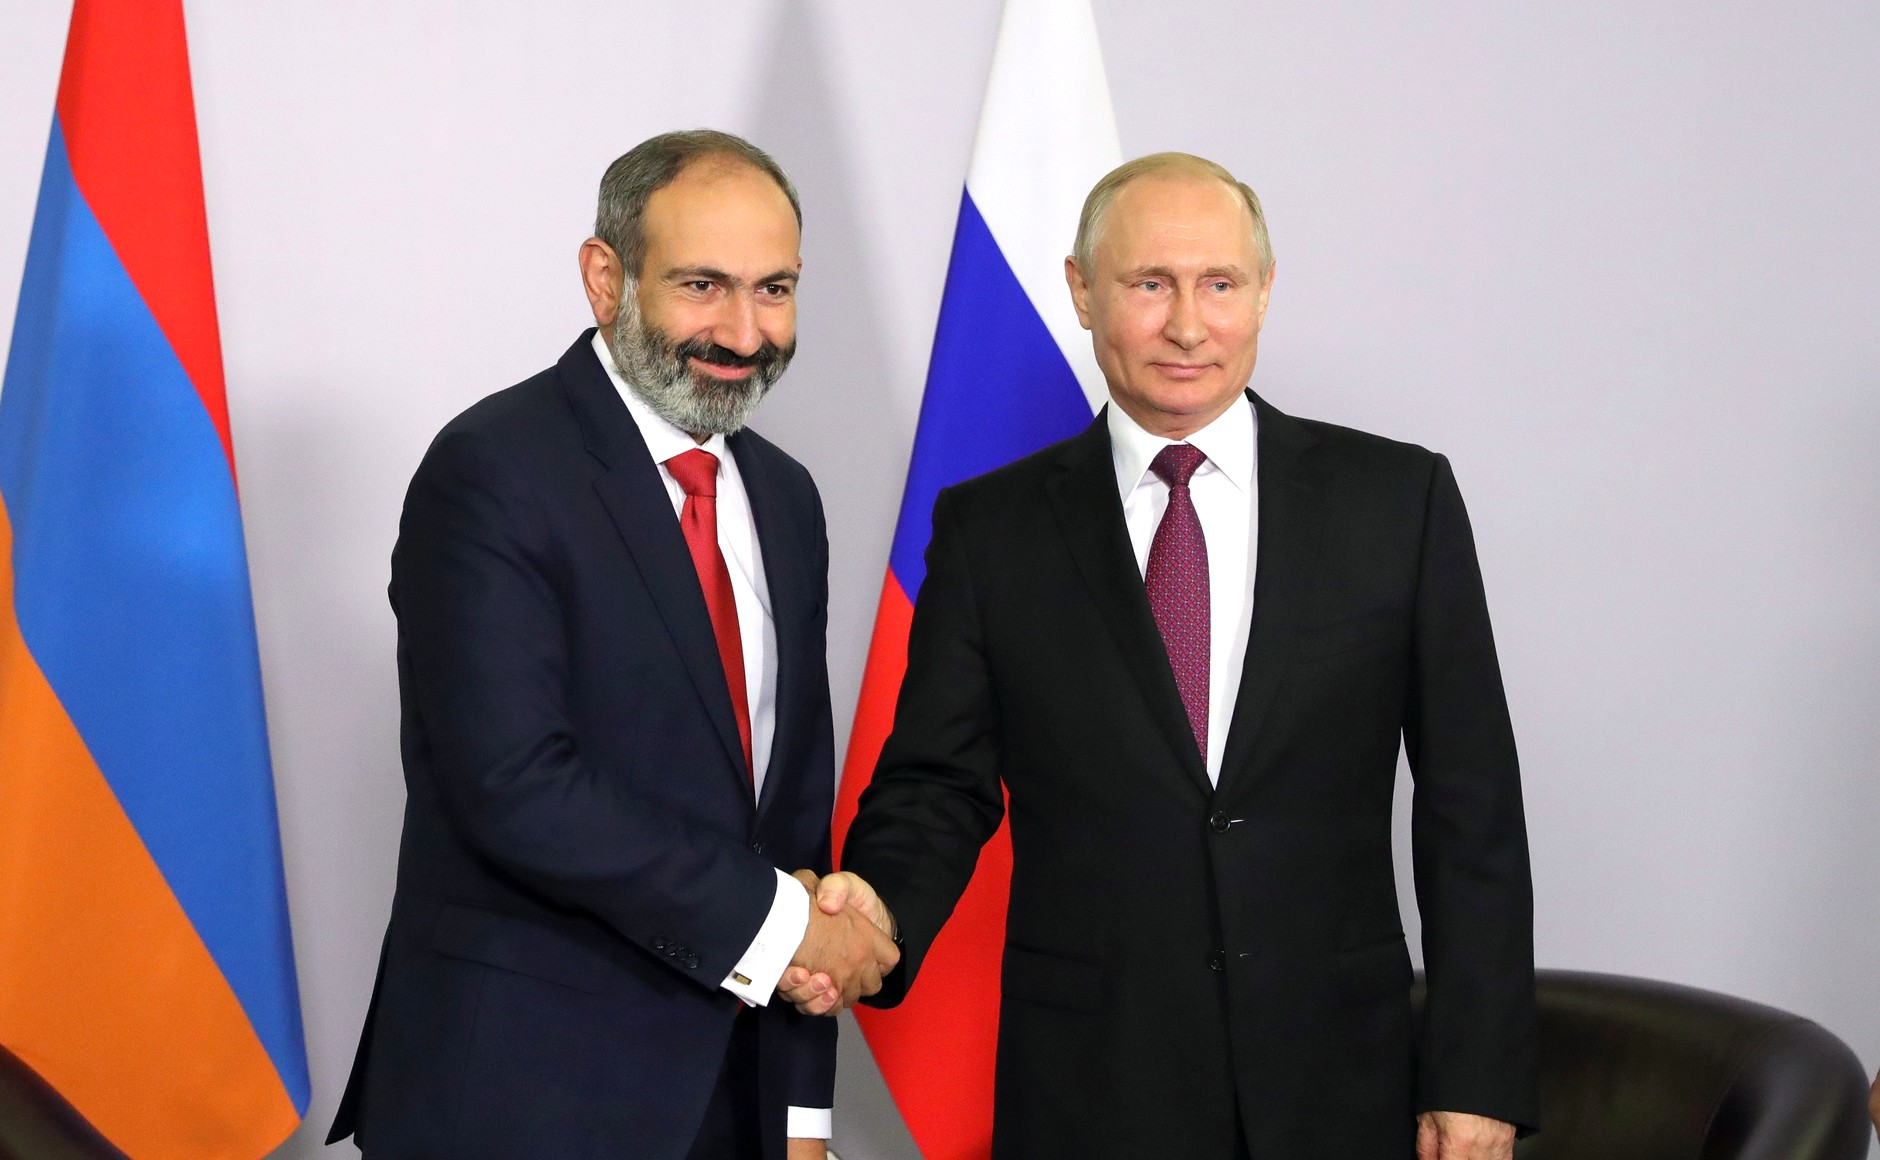 Nikol Pashinyan et Vladimir Poutine